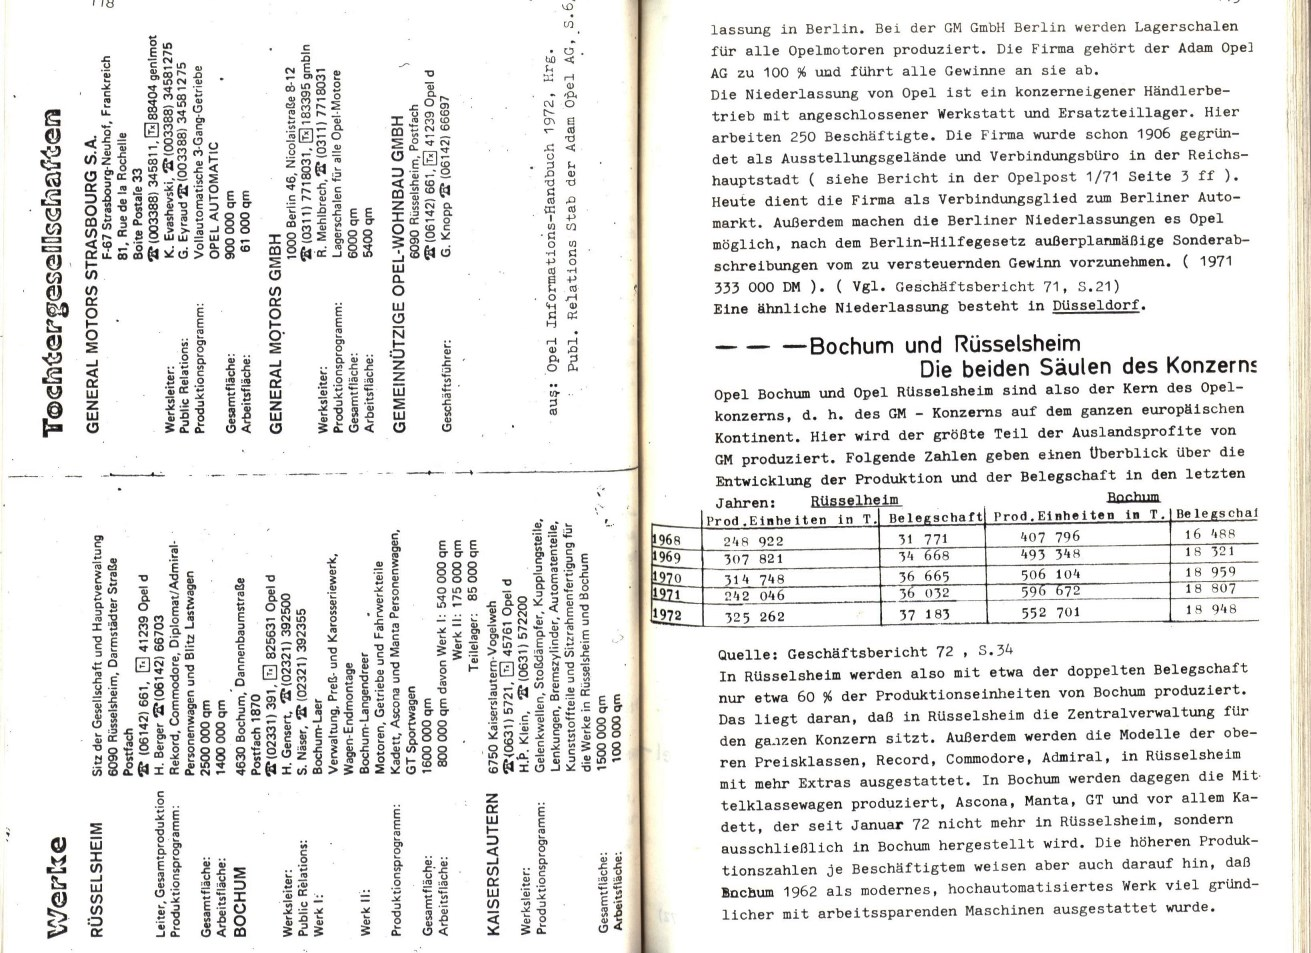 Bochum_IGM_Opel_PG_Opel_streikt_1973_061